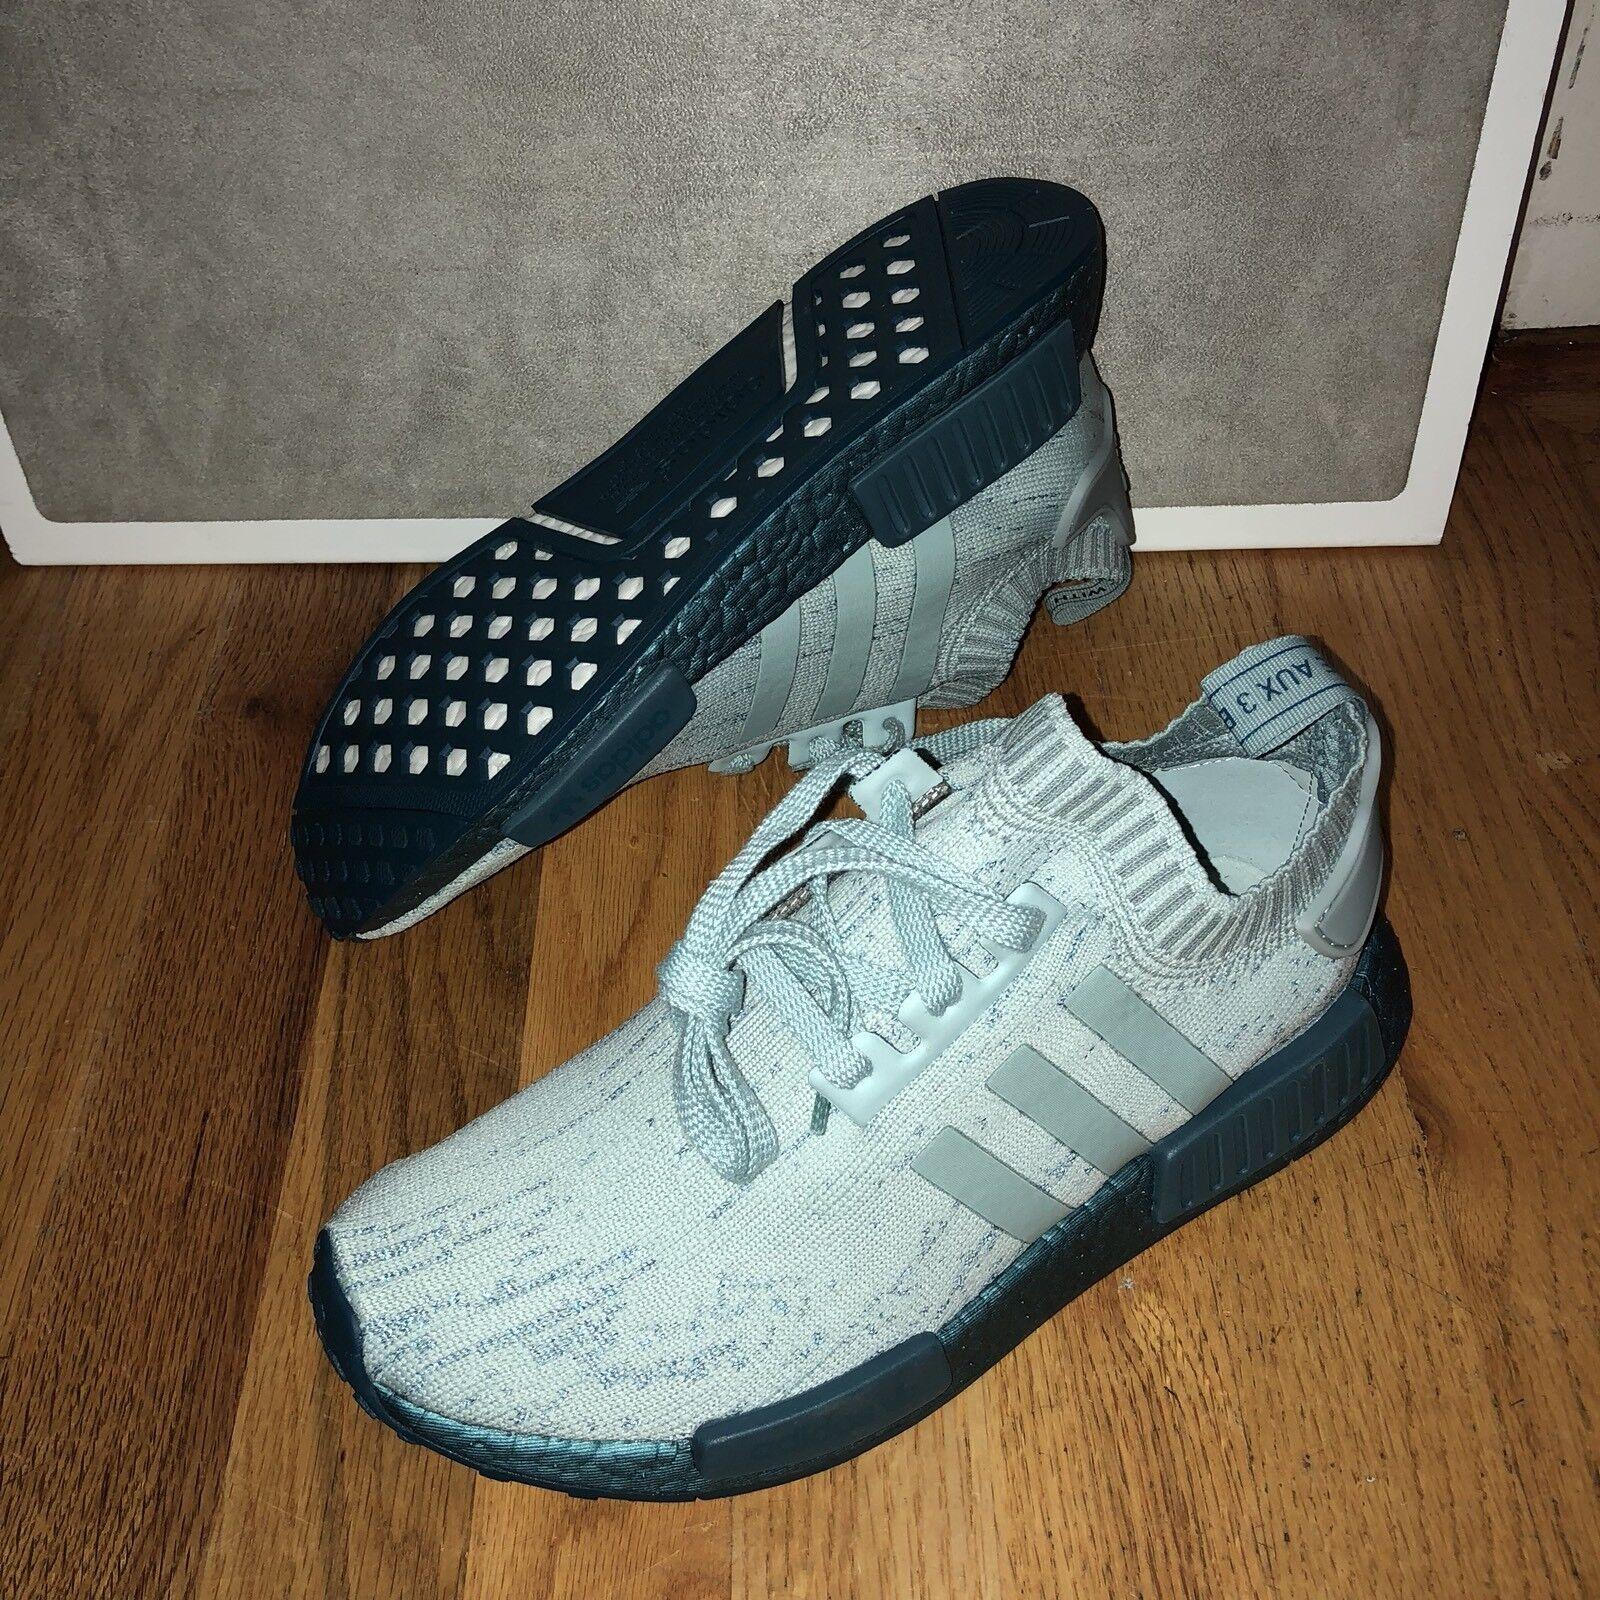 d797234bb Adidas NMD R1 R1 R1 PK Primeknit Sea Crystal Blue Boost CG3601 Womens Shoes  Size 9 New 16177e